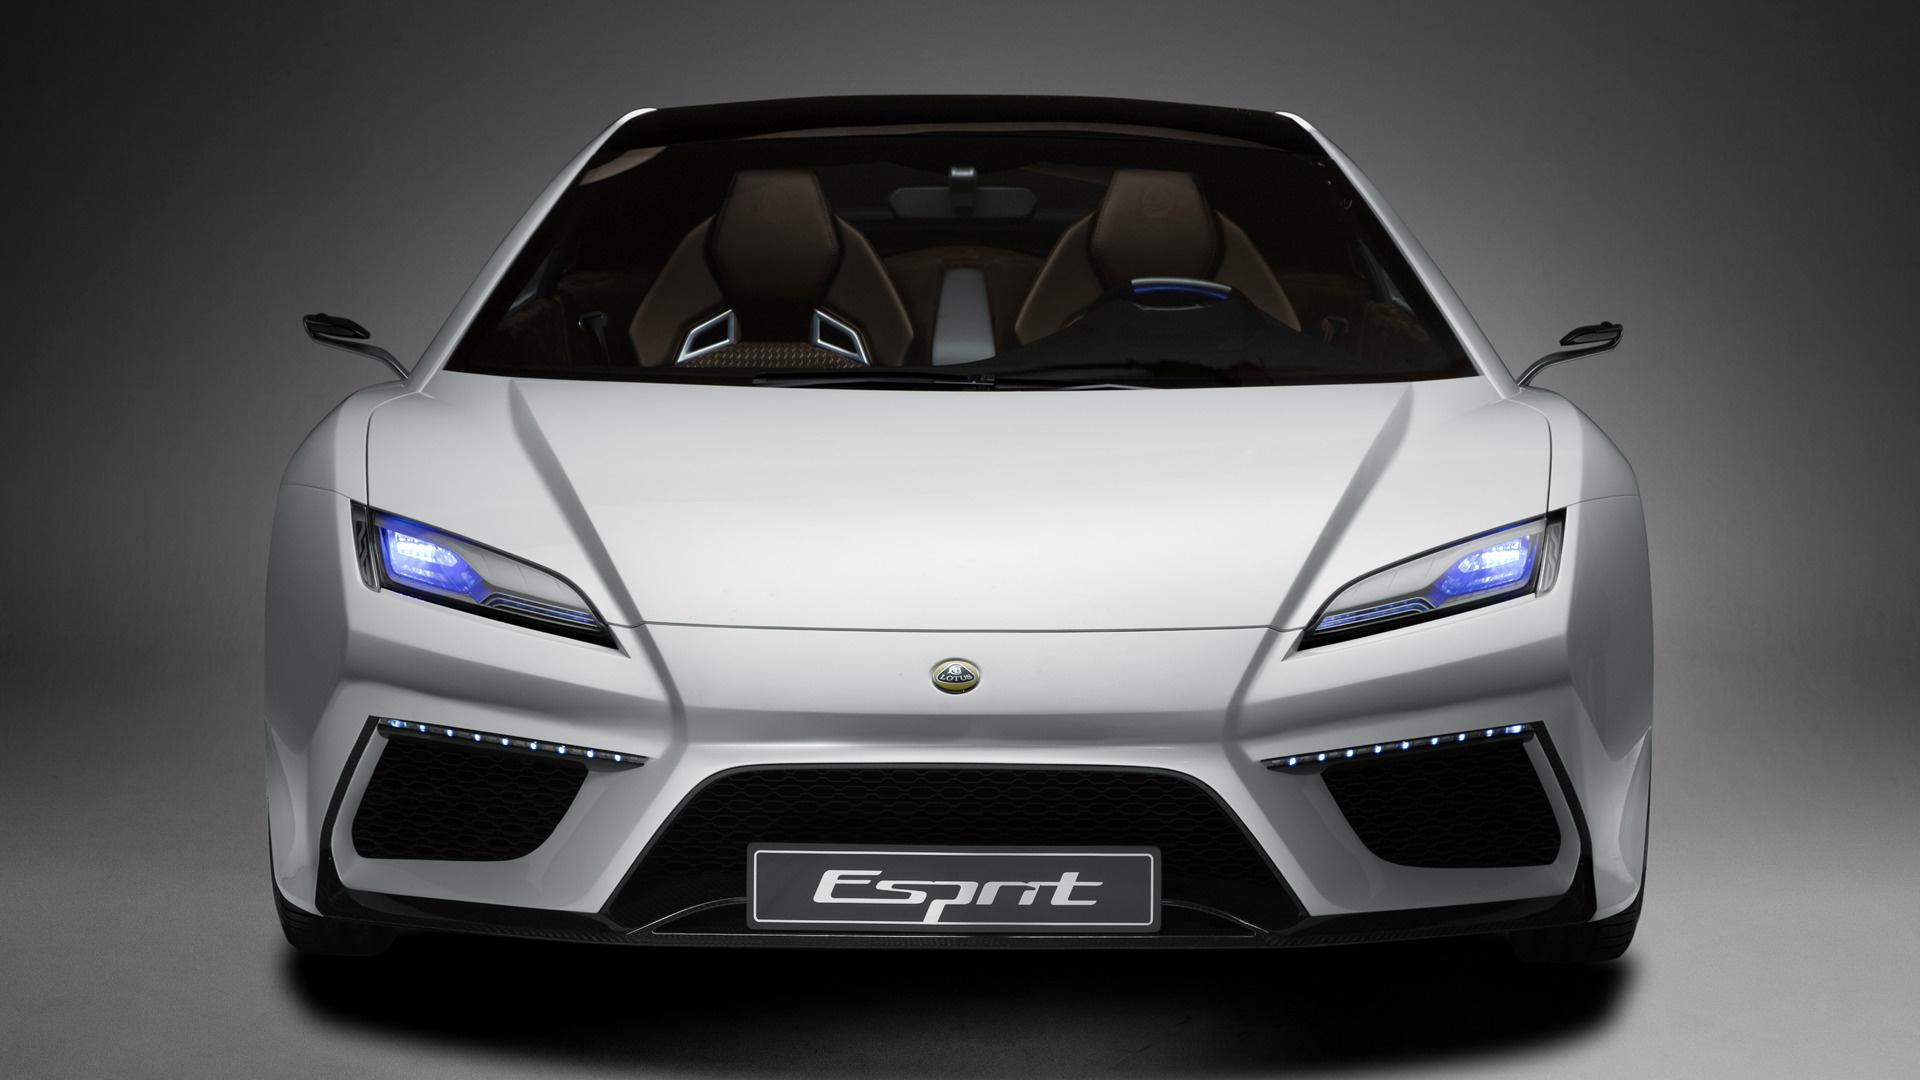 https://www.carpixel.net/w/76359c31b3caafac6f24428c64db1e10/lotus-esprit-concept-wallpaper-hd-41986.jpg